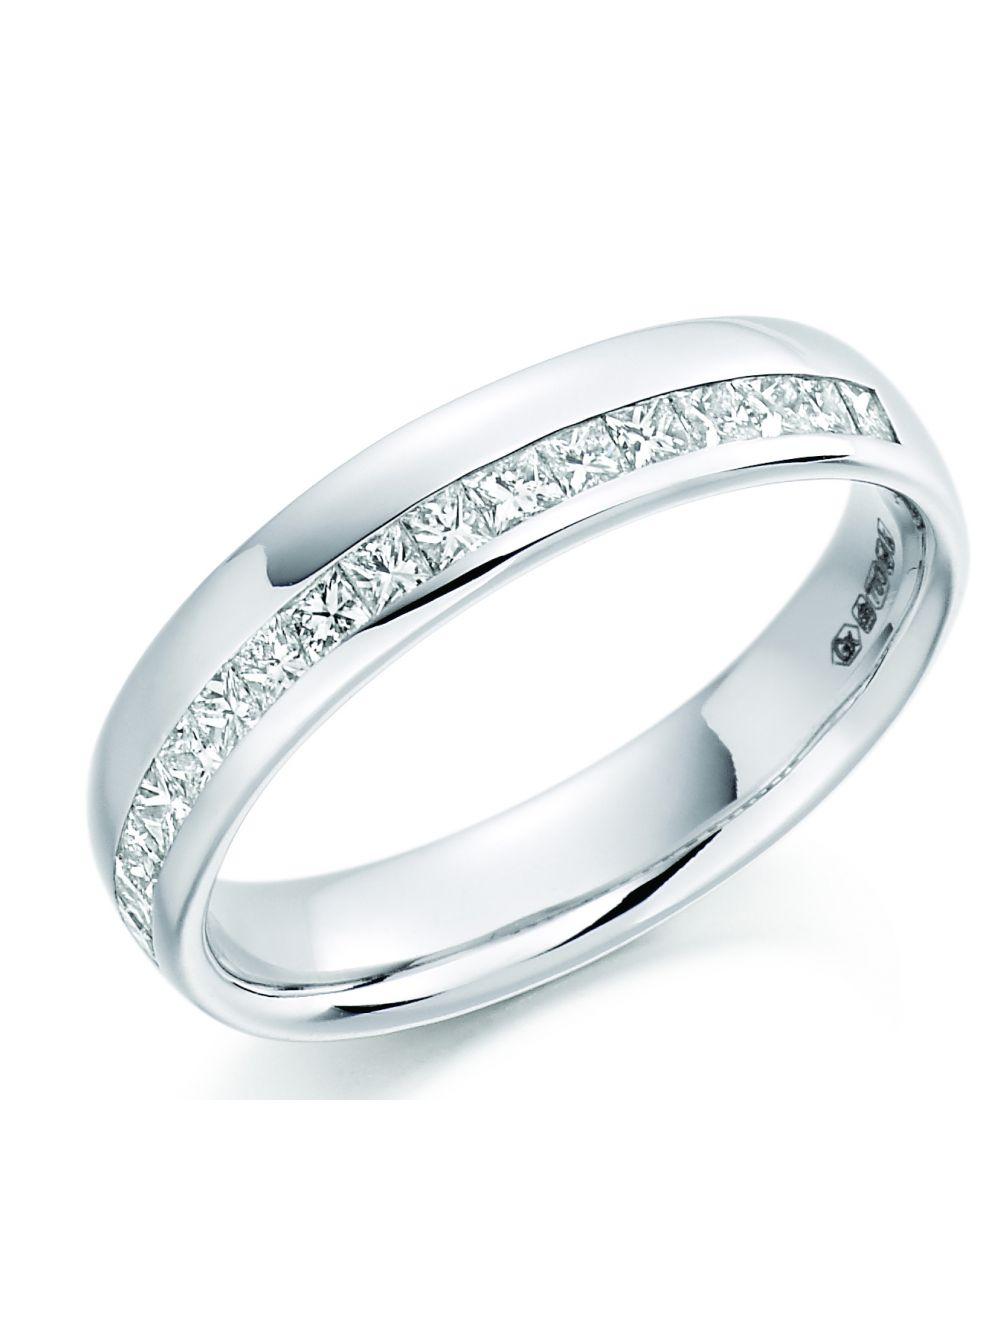 18ct White Gold Princess Cut Diamond Wedding Band